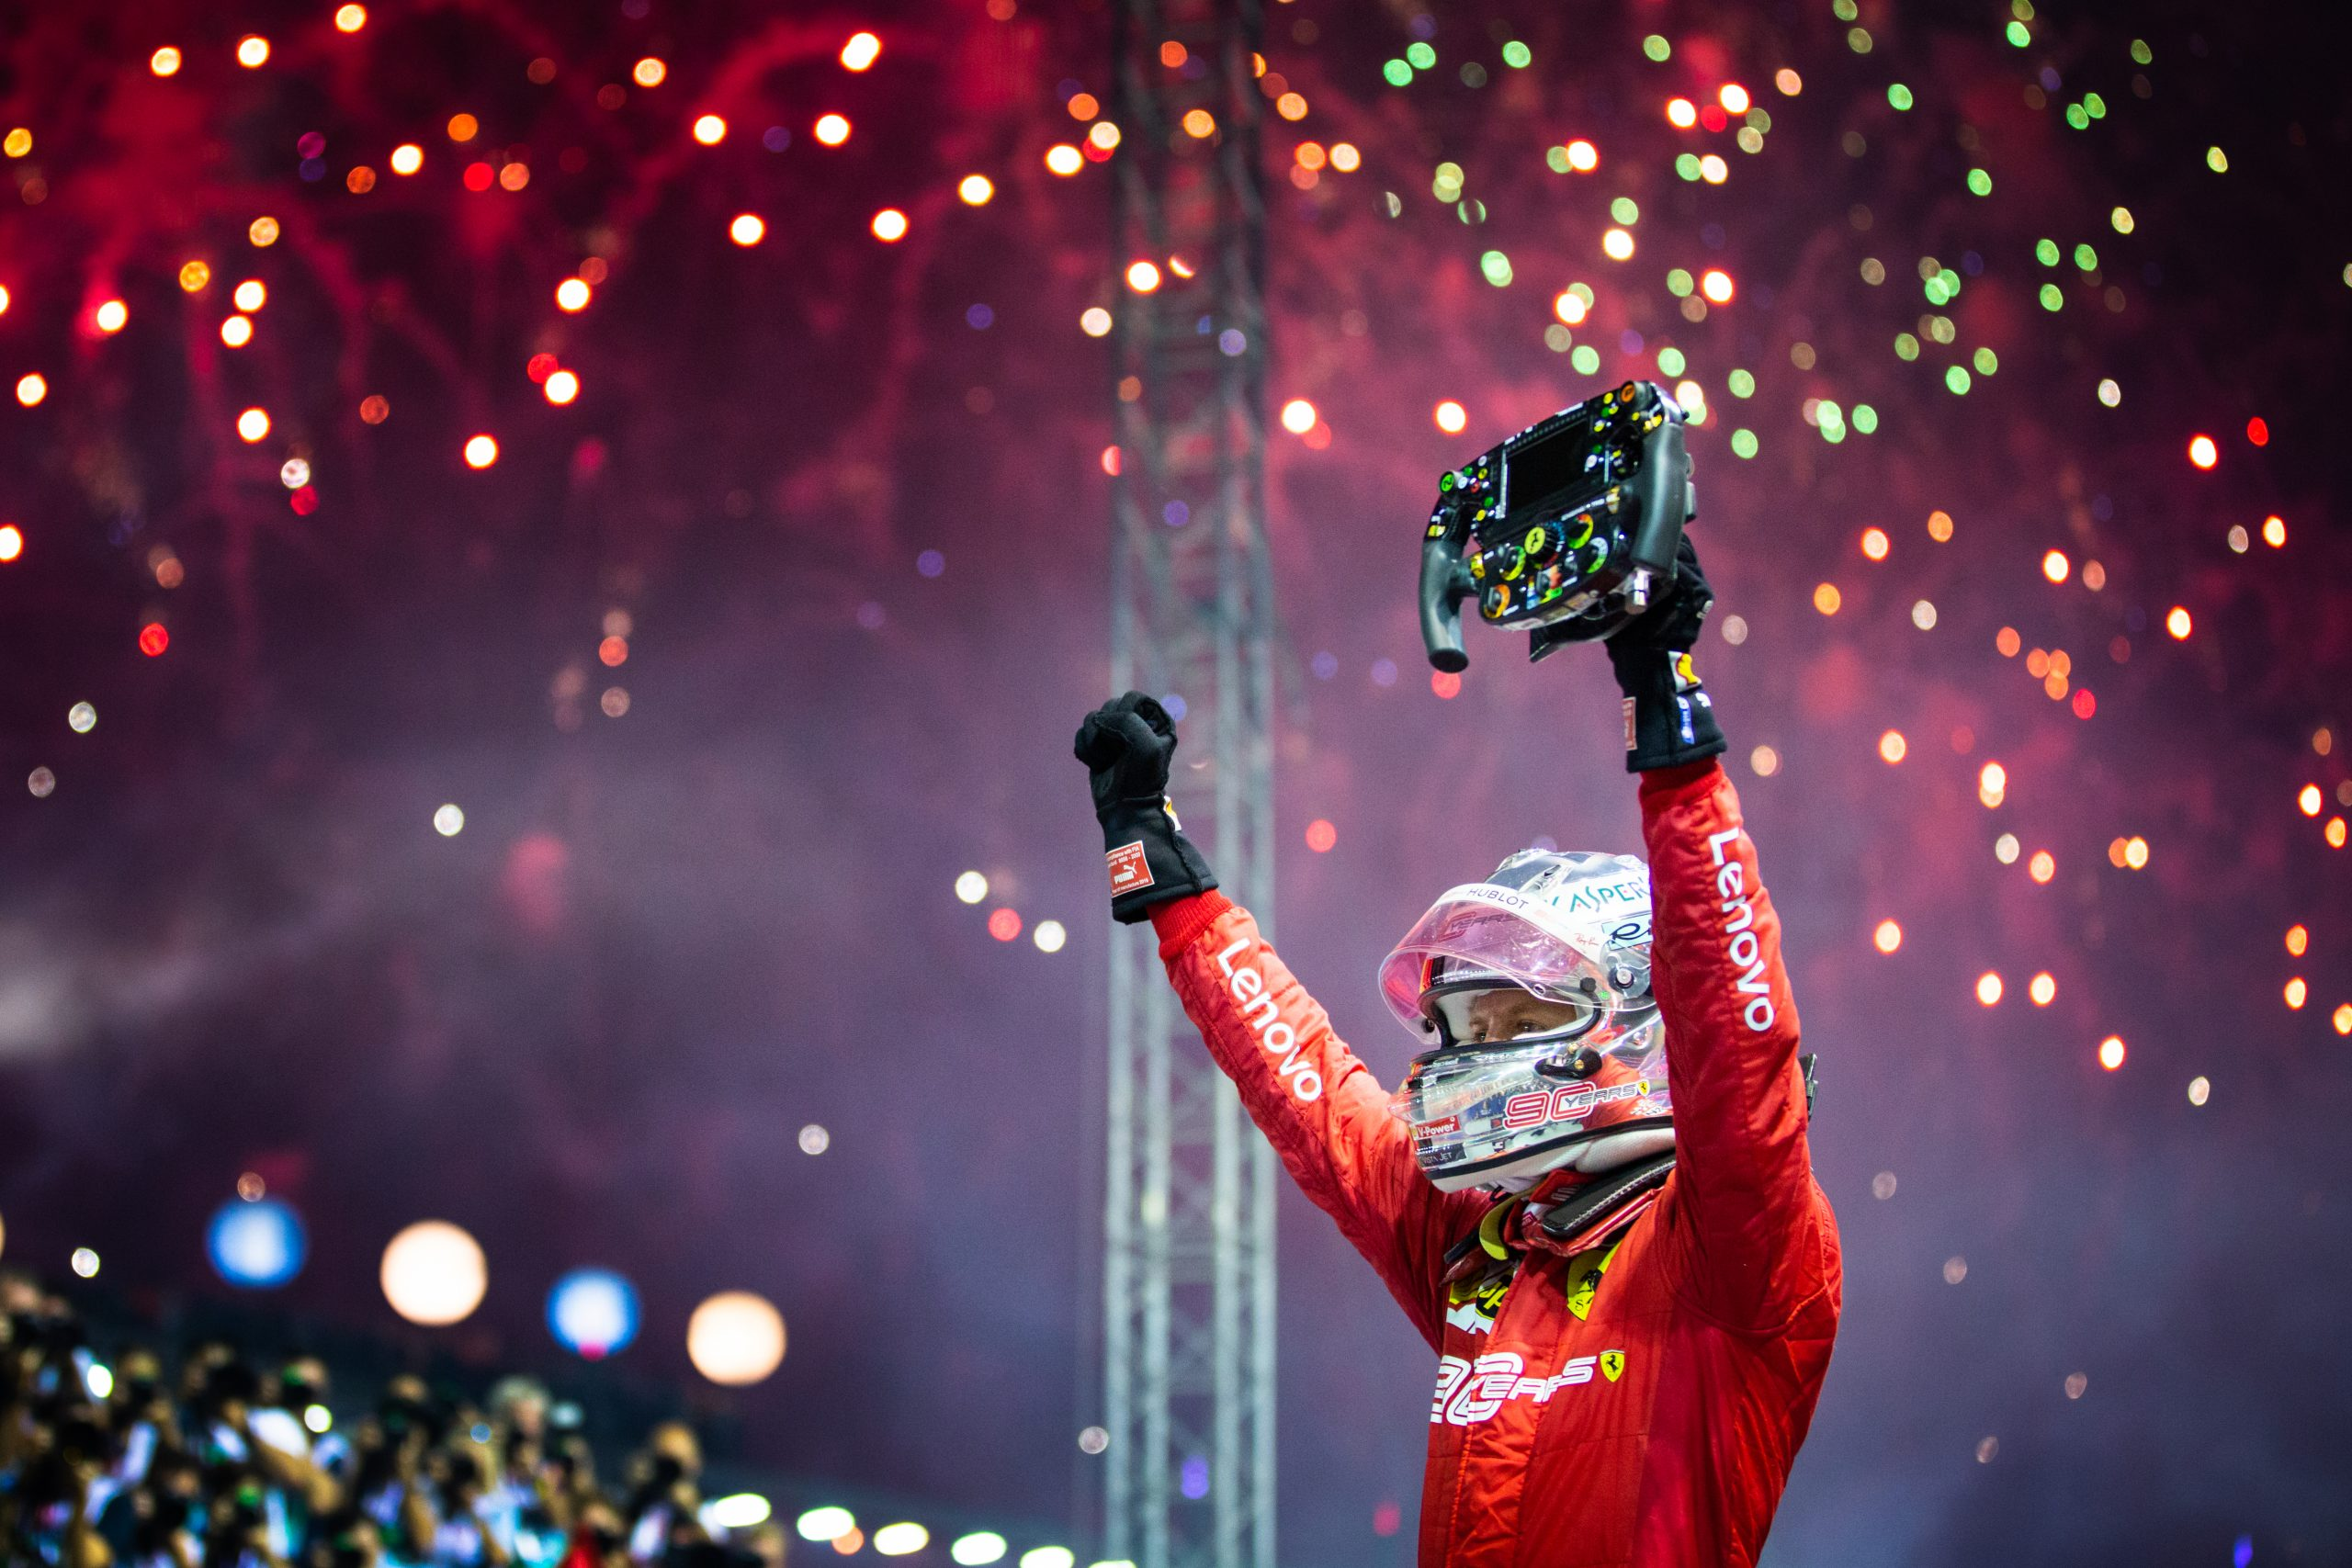 F1 – SINGAPORE GRAND PRIX 2019